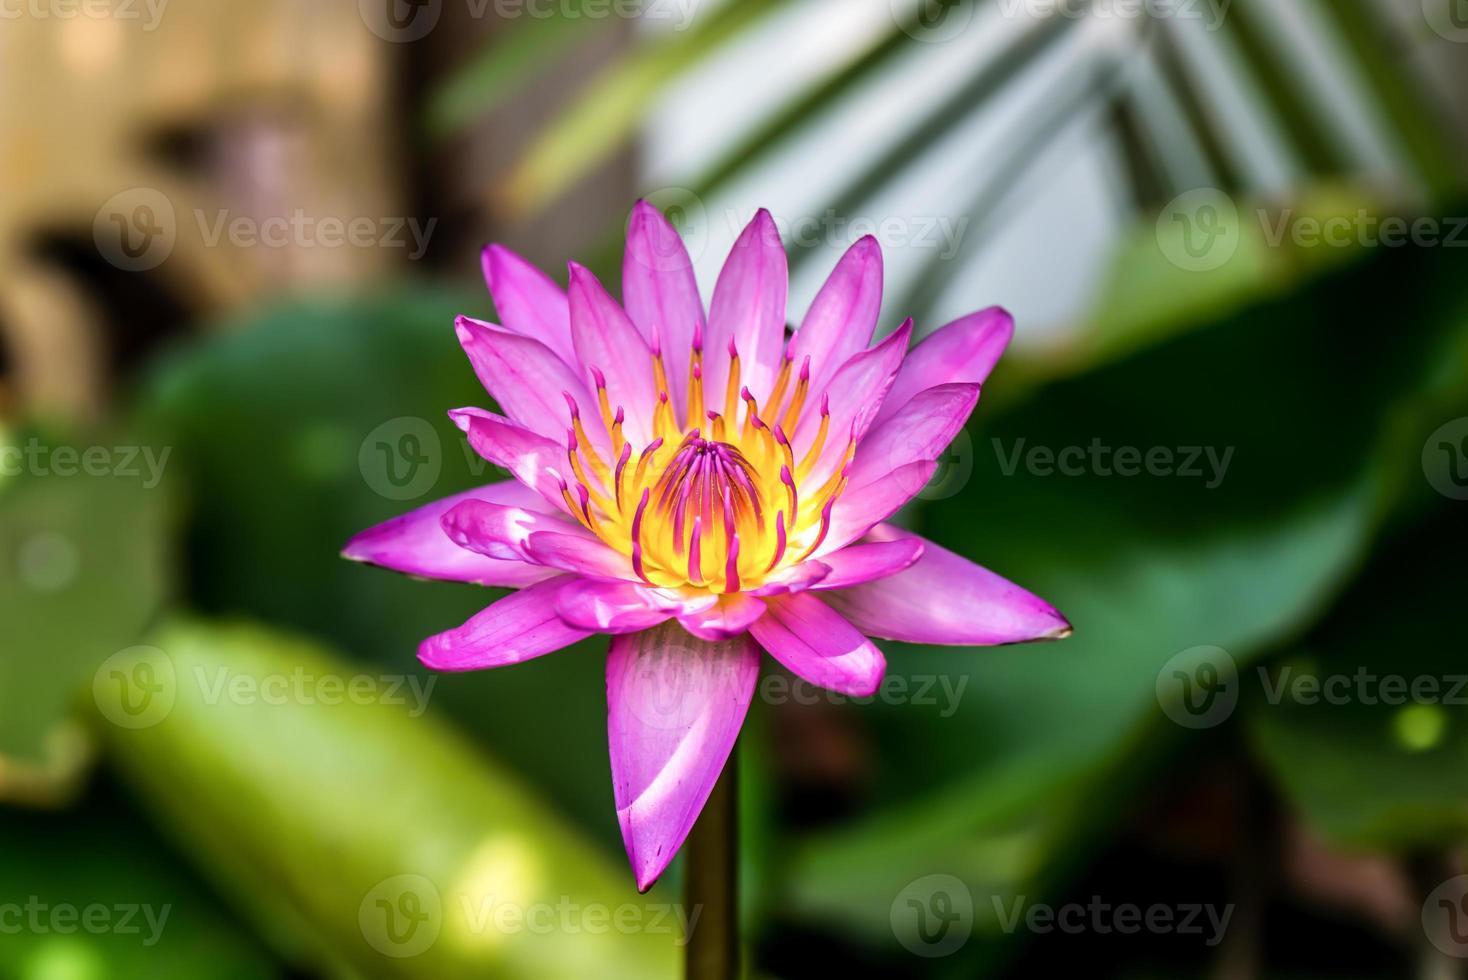 cerca de la flor de loto de color amarillo-rosa. foto